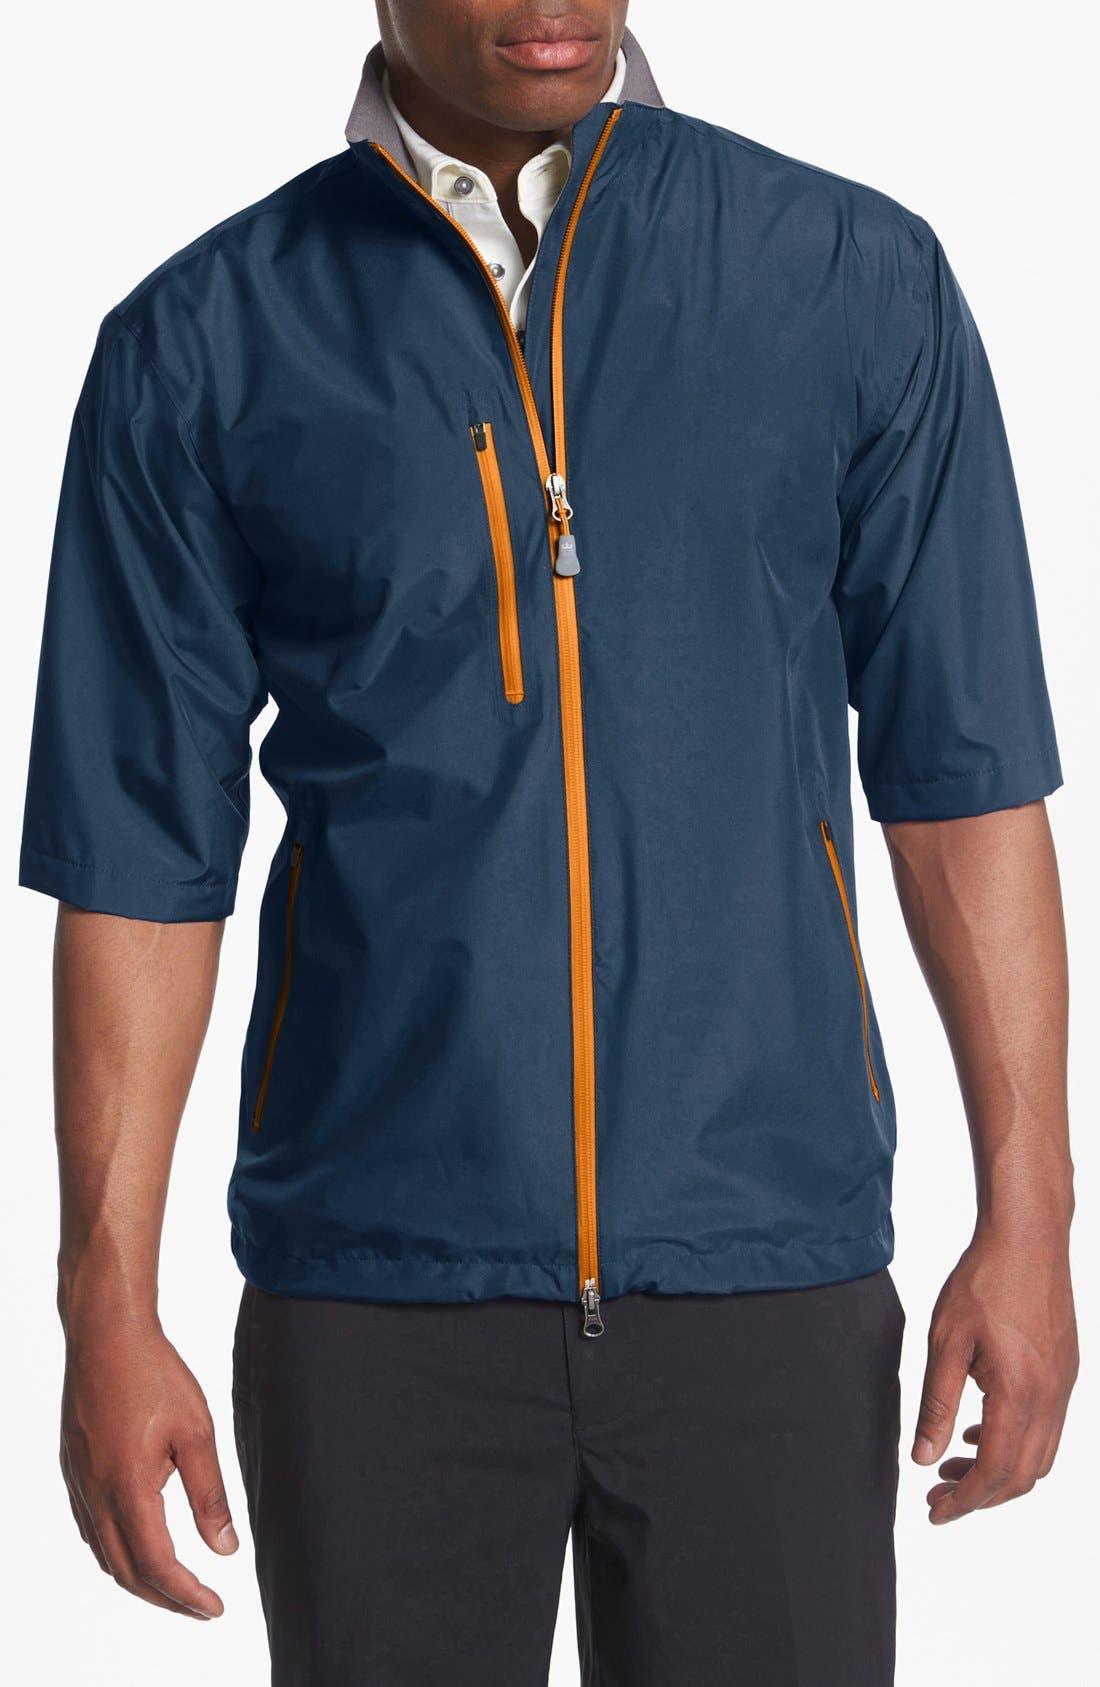 Main Image - Peter Millar 'Toronto' Short Sleeve Rain Jacket